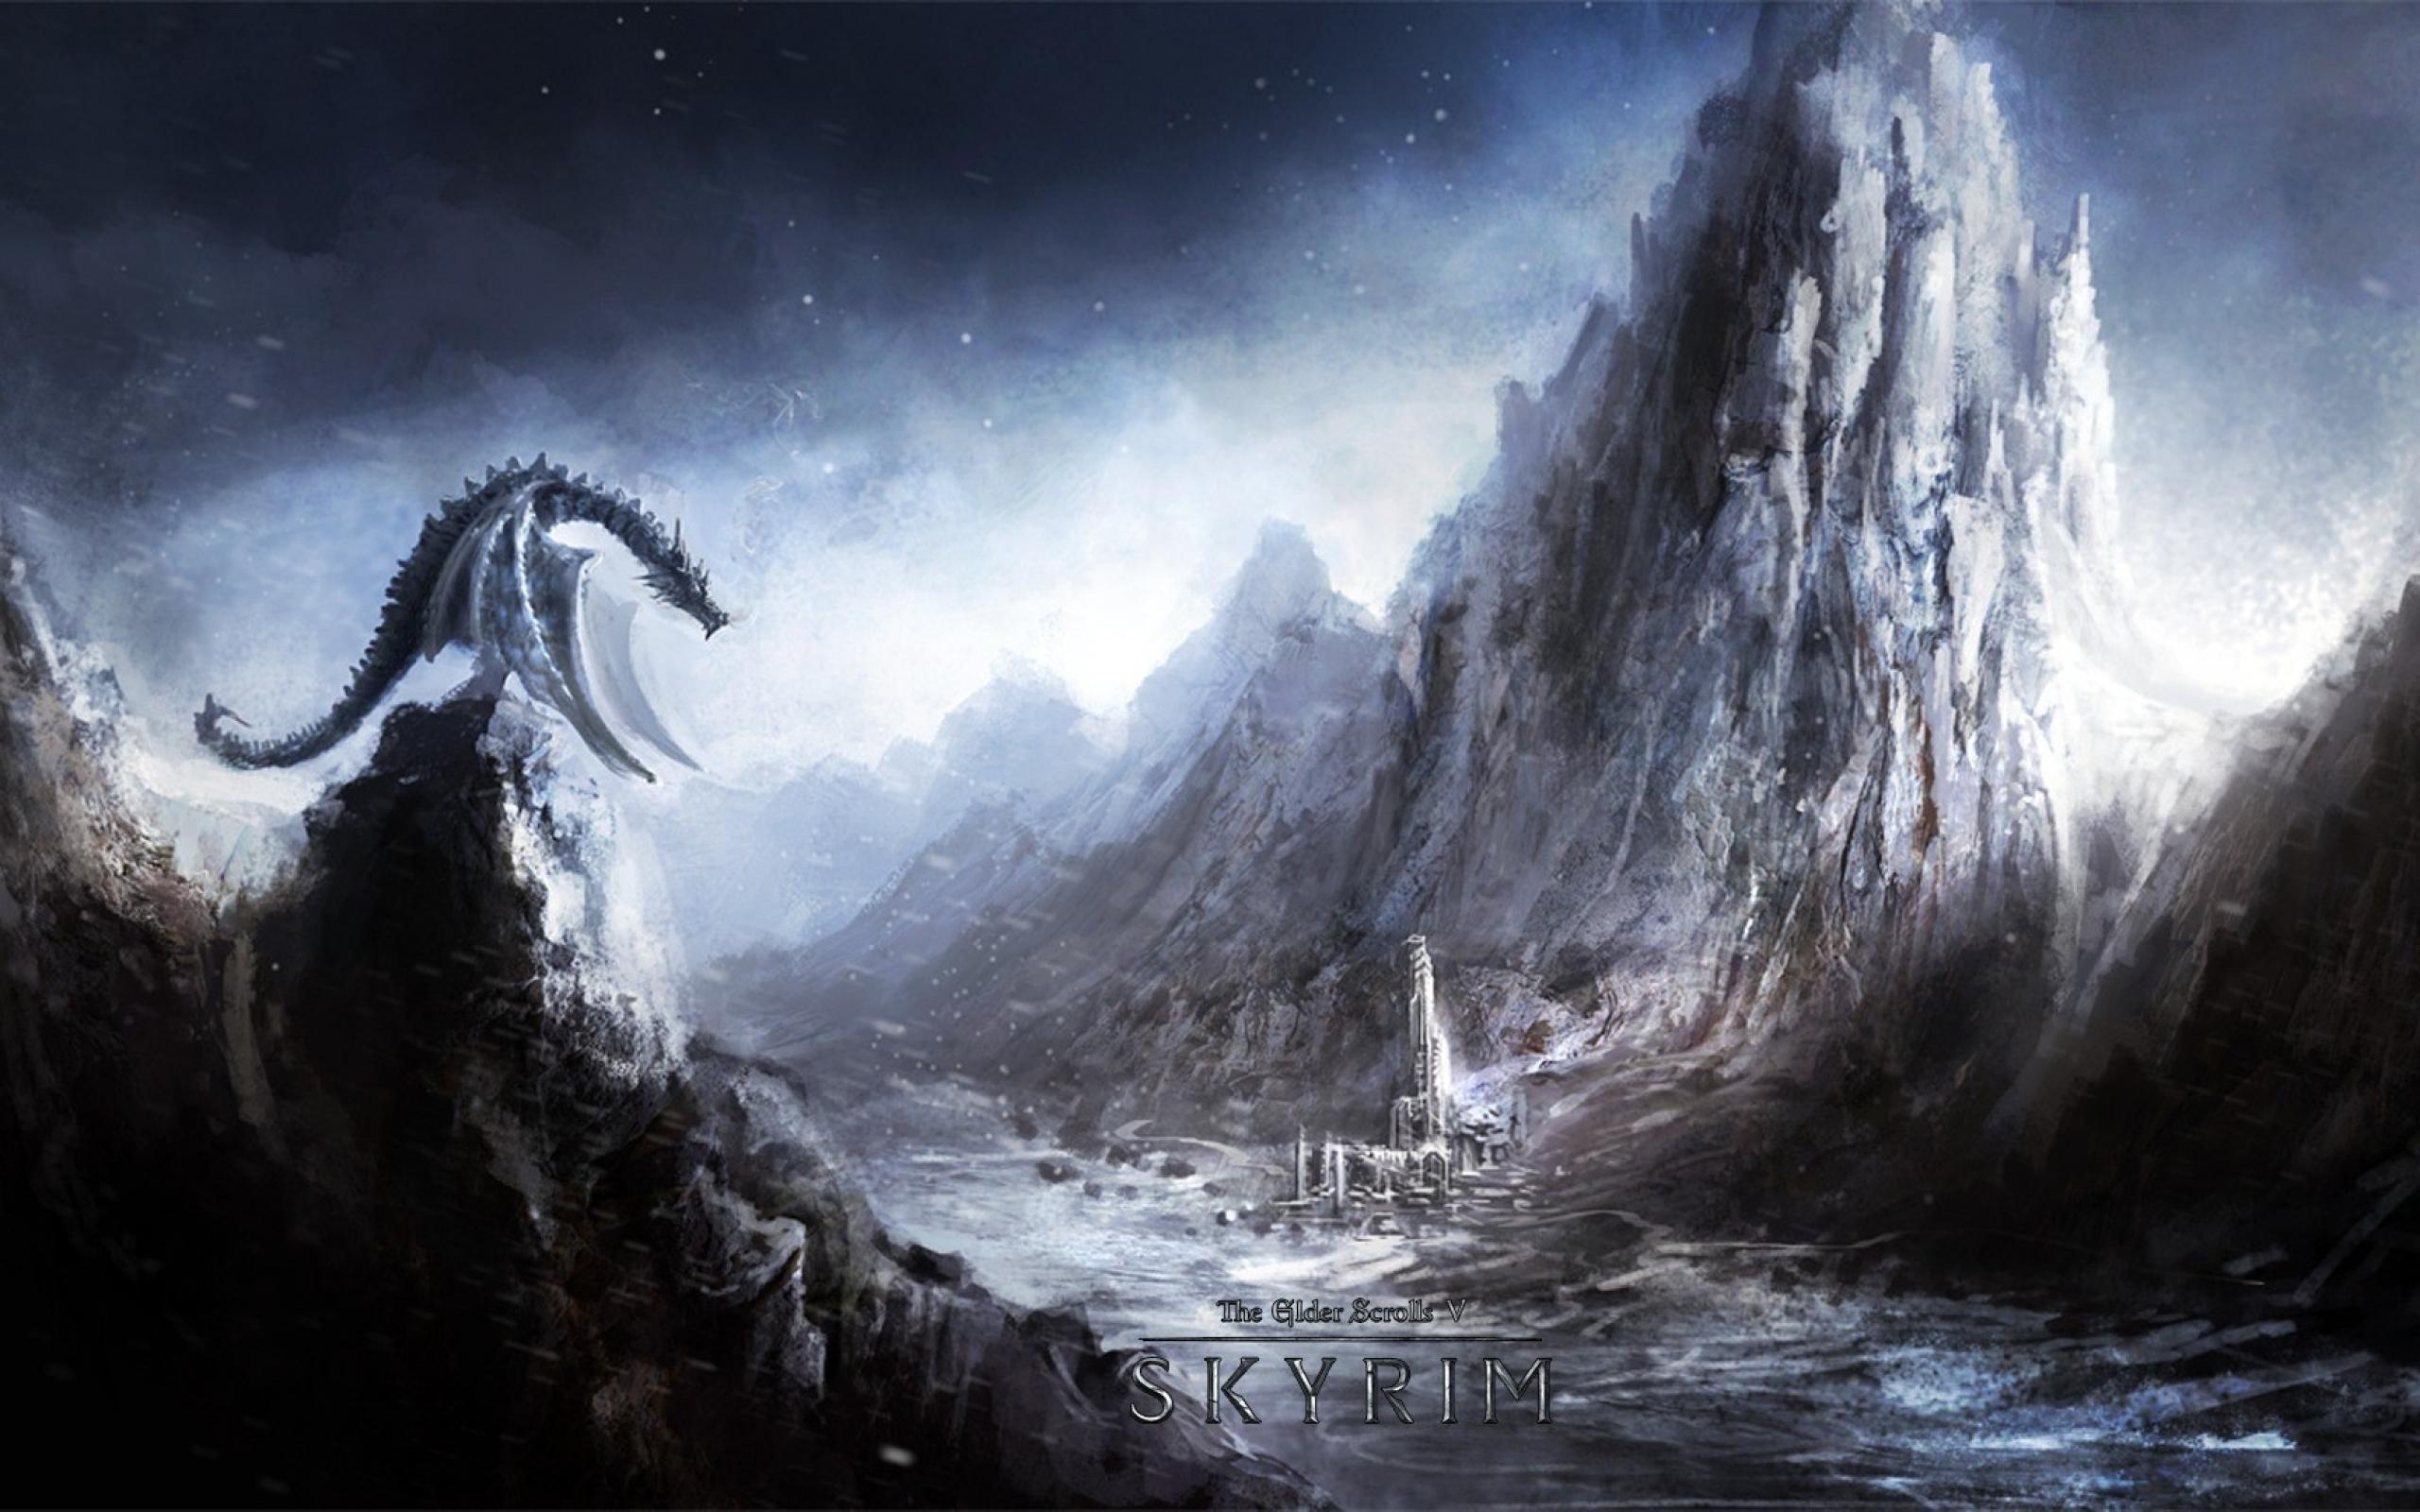 skyrim wallpaper image - minimongo - mod db